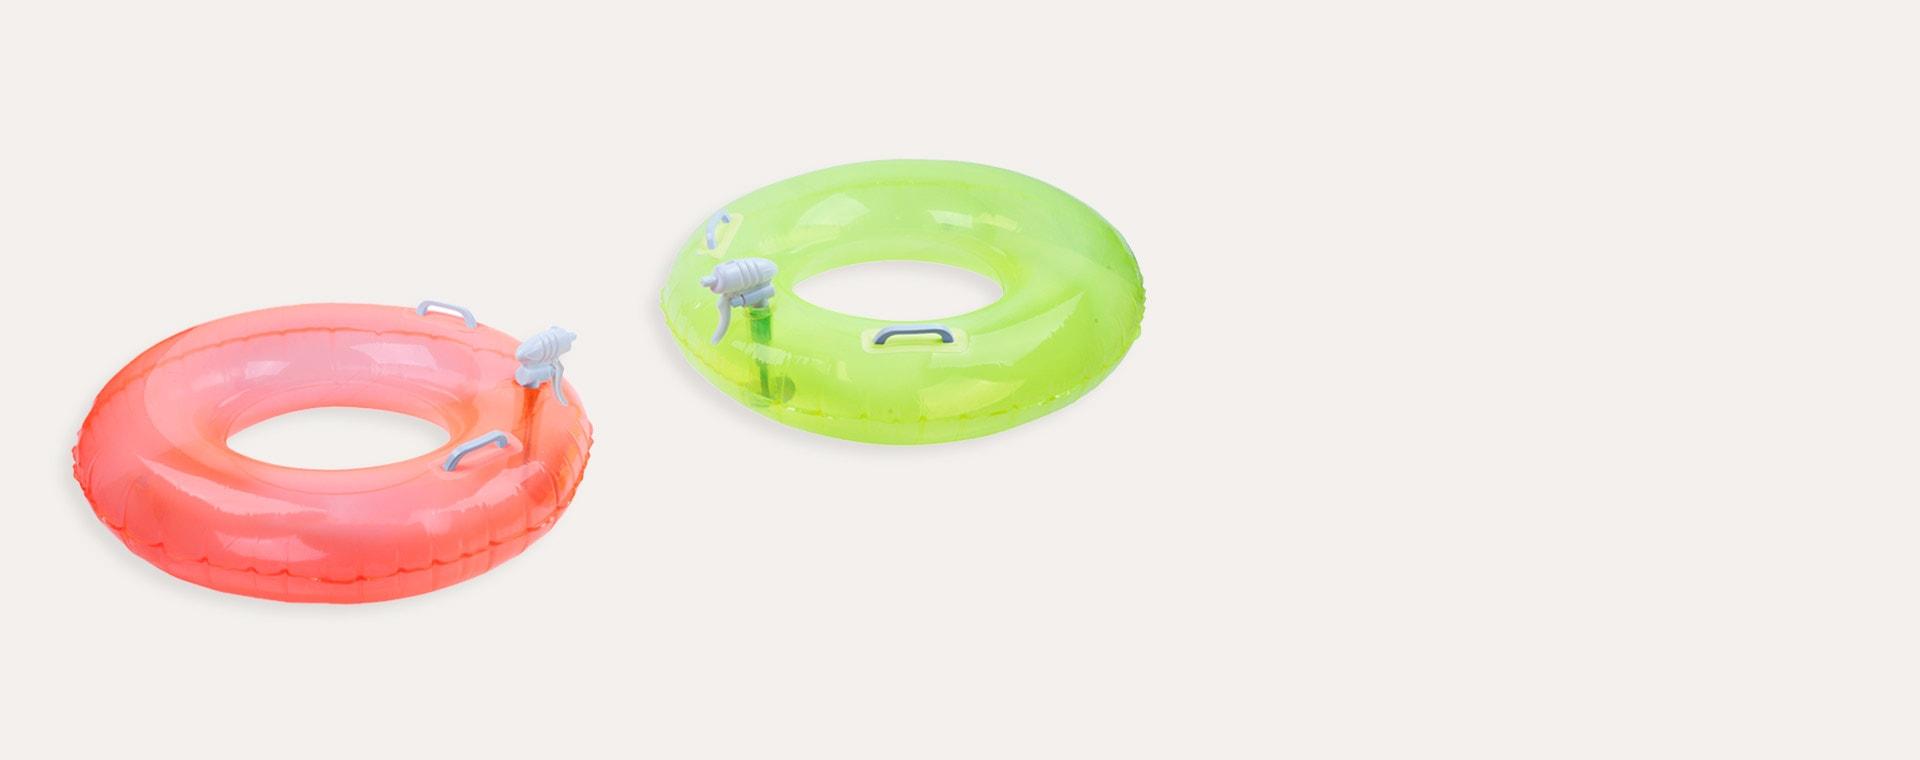 Multi Sunnylife Pool Ring Soakers